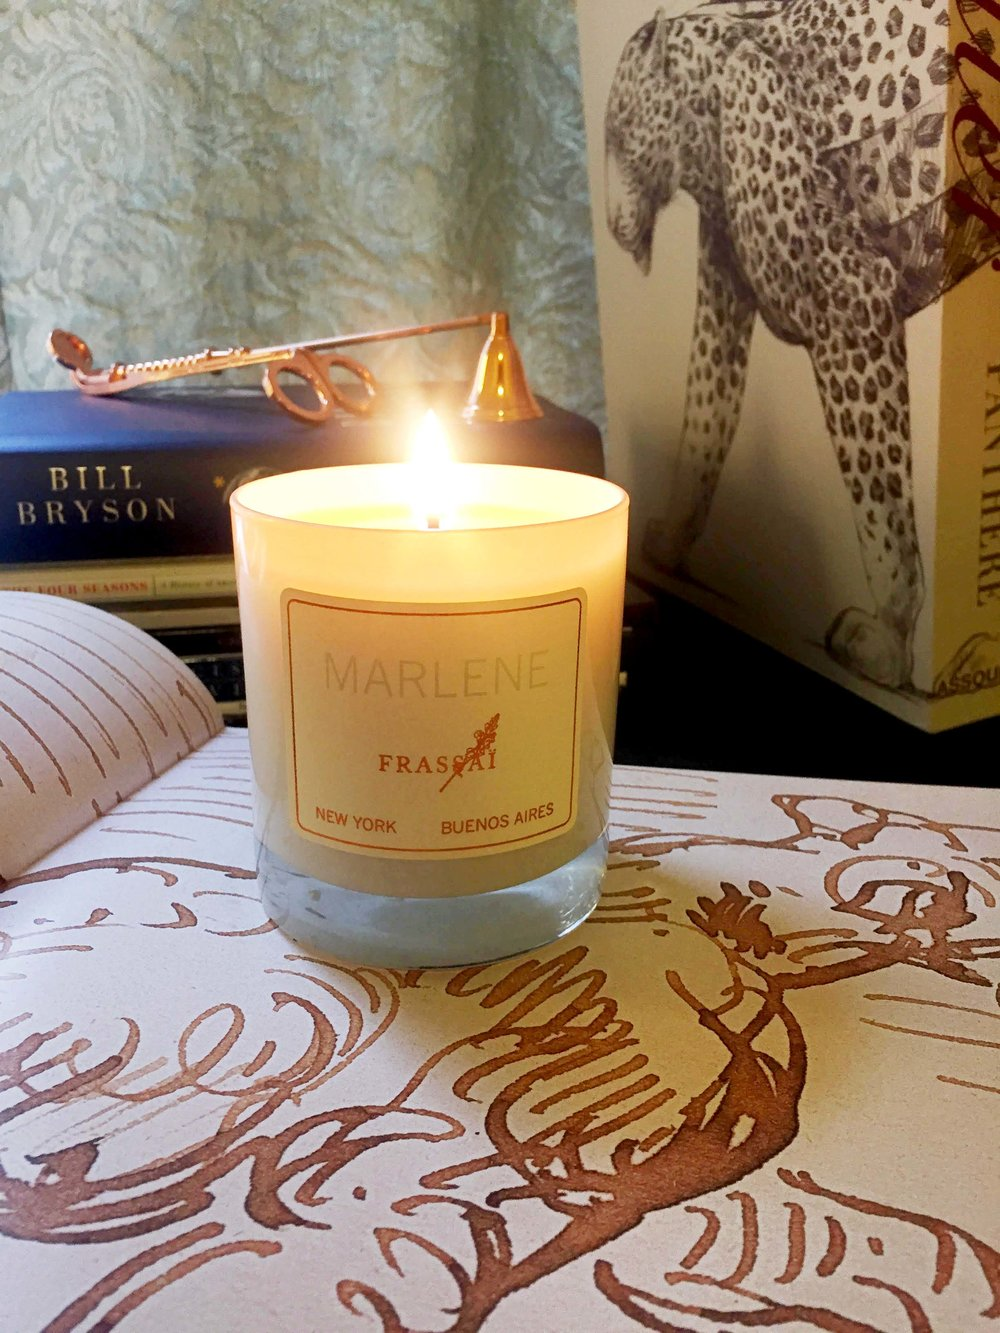 Marlene scented candle ~ dark oak, narcissus, aged Scotch whisky, Vuelta Abajo tobacco, leather, vanilla cream